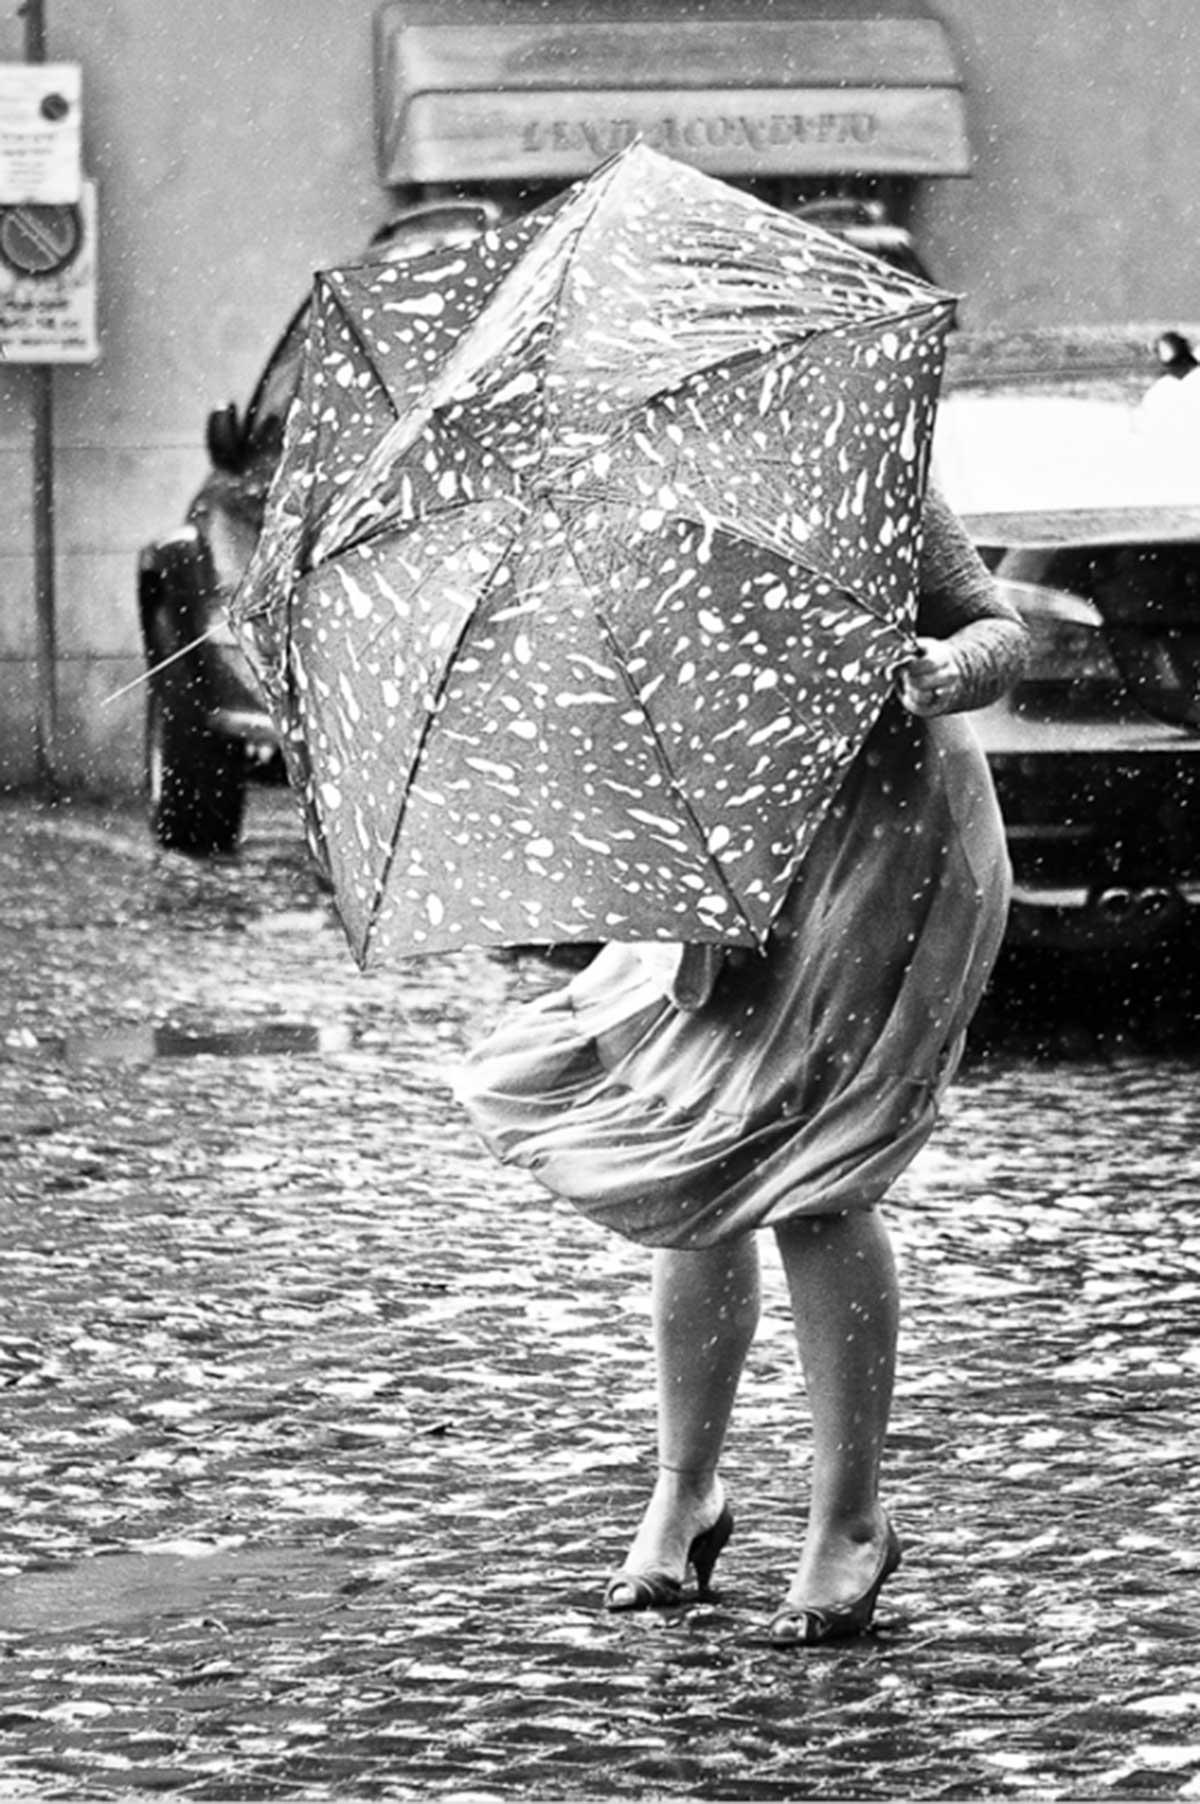 Oyvind-Gregersen---umbrella-style